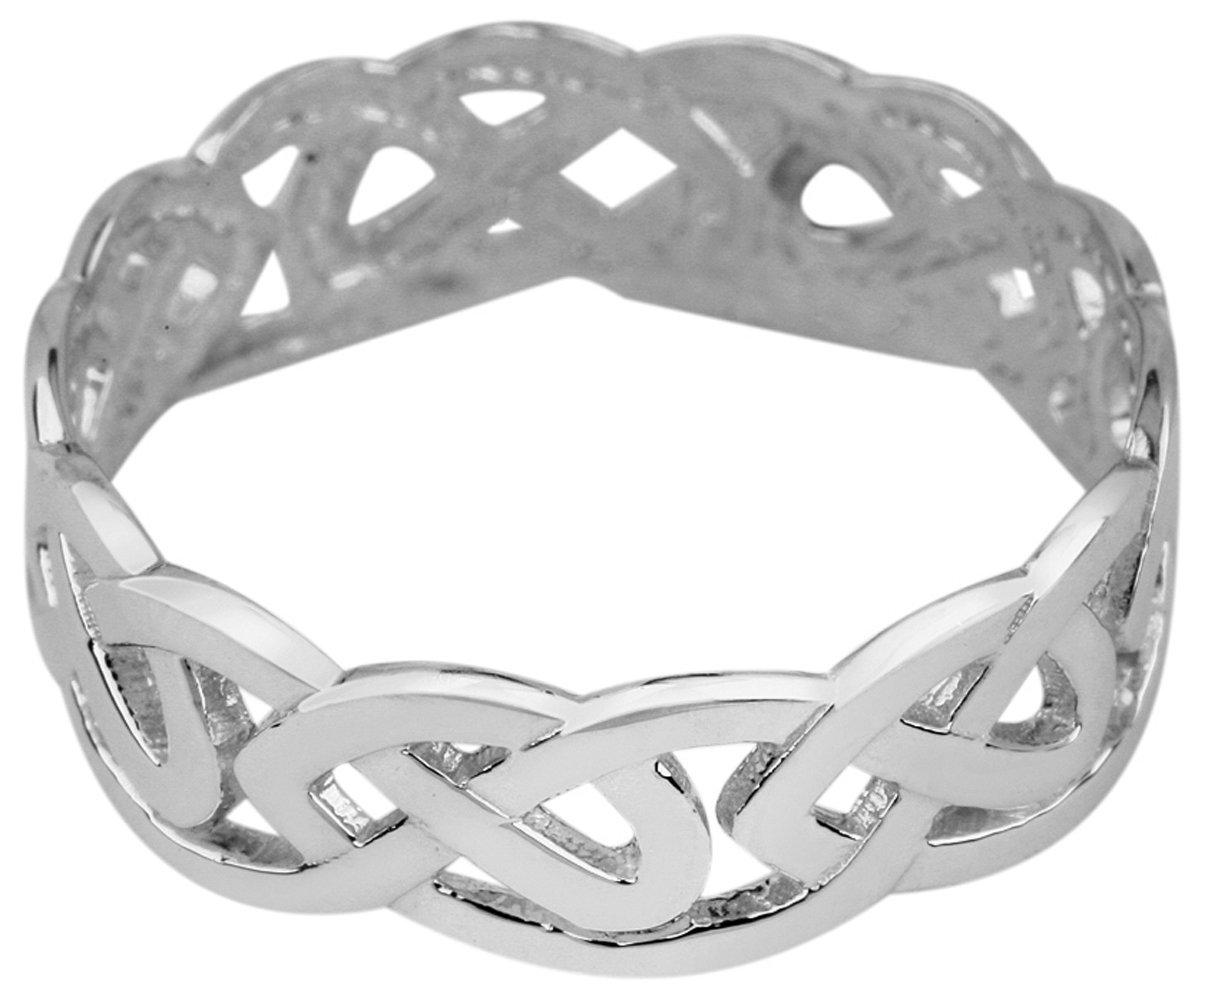 Fine 10k White Gold Celtic Wedding Band Trinity Knot Eternity Ring (7) by Celtic Wedding Bands